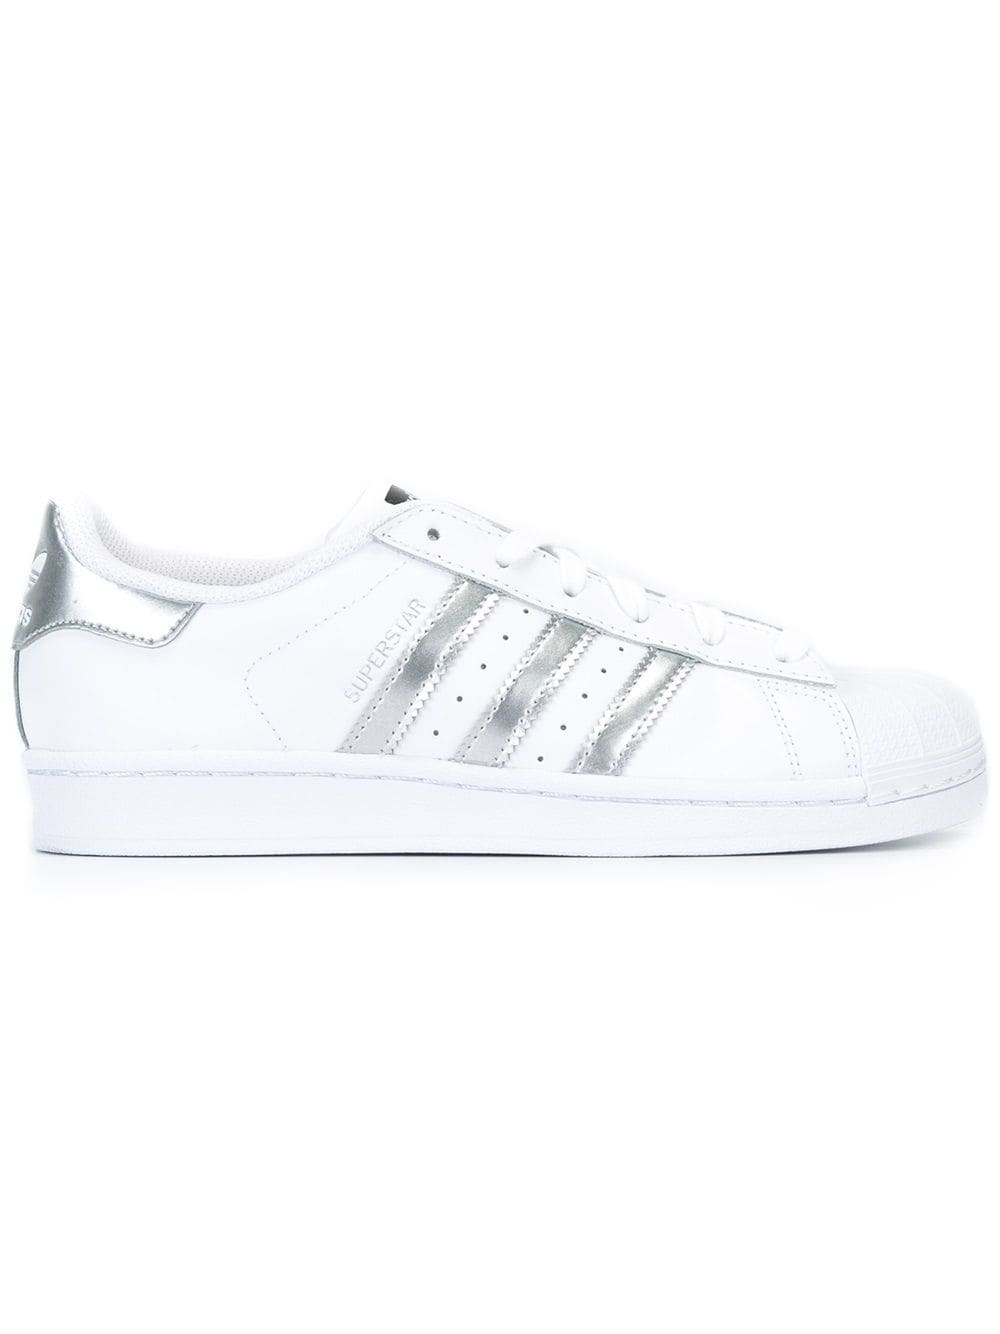 Adidas Adidas Originals Superstar sneakers - Wit